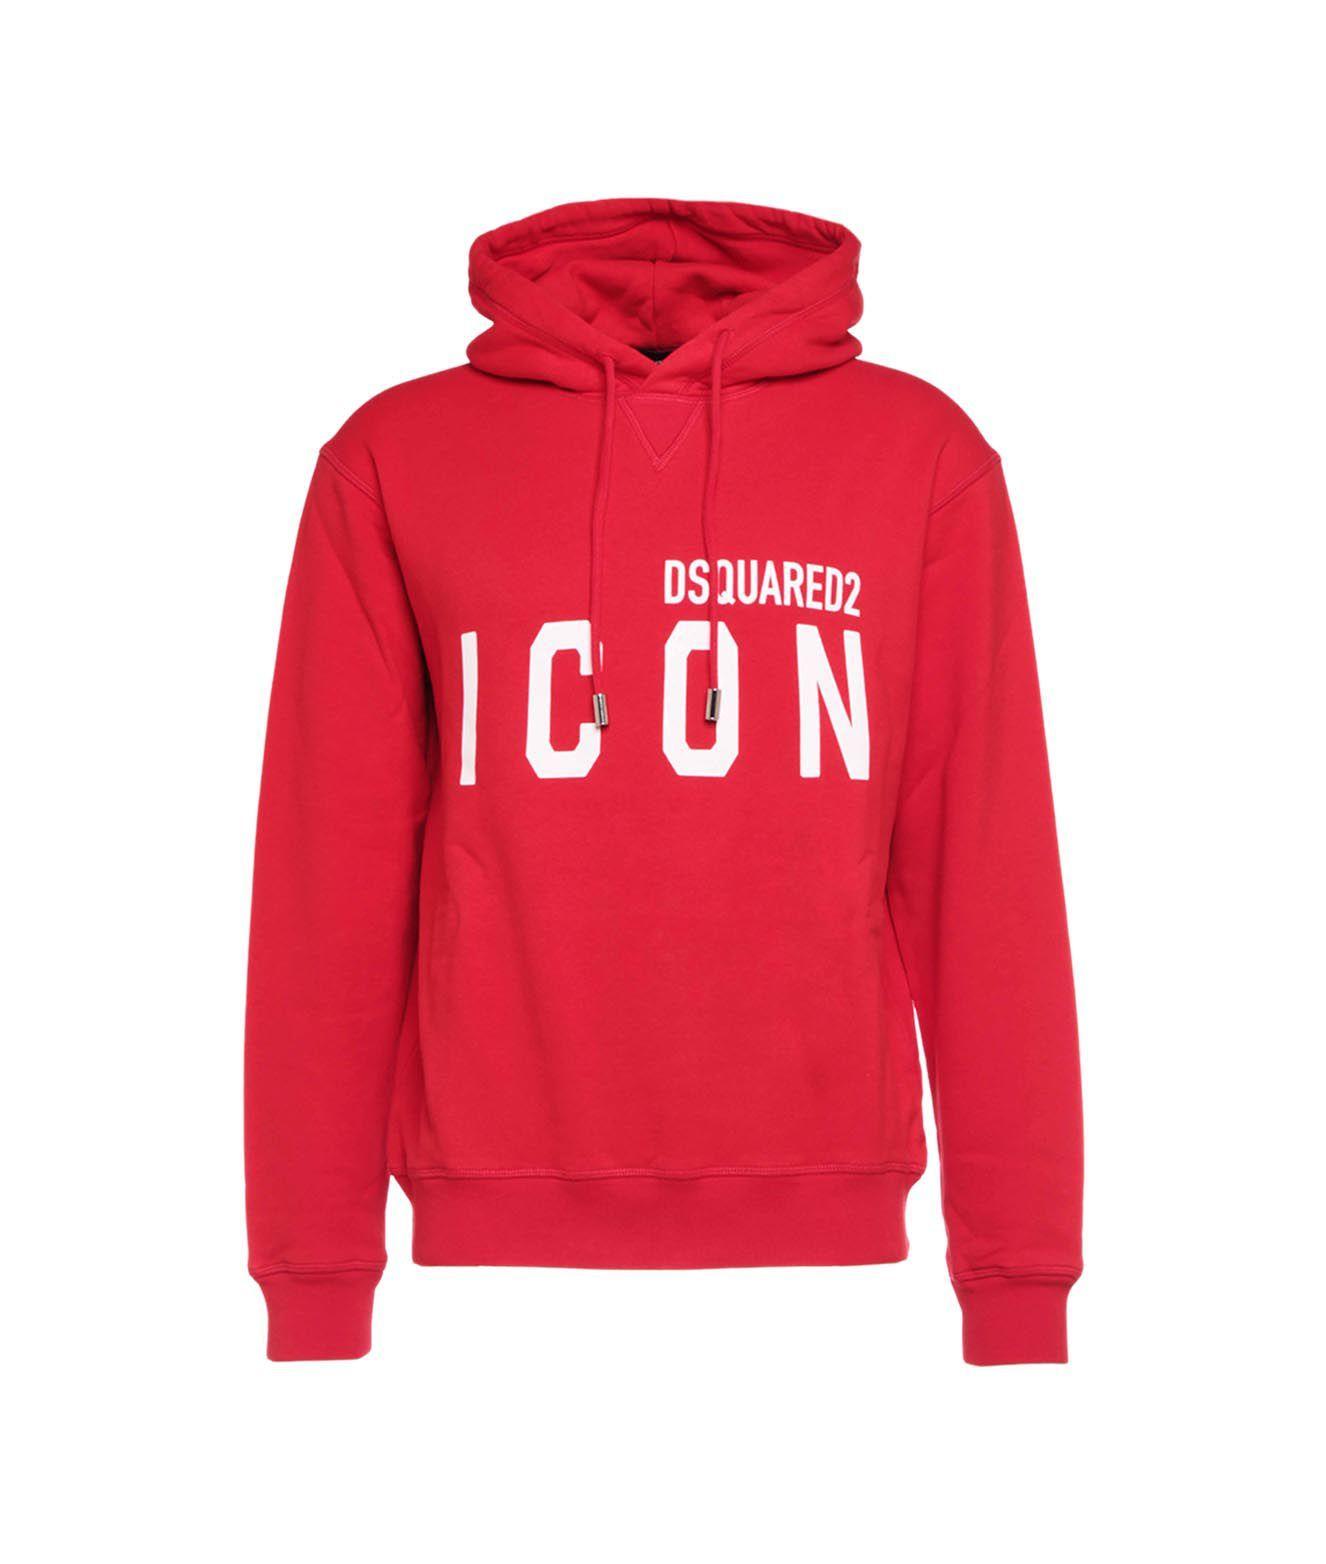 Dsquared2 Sweatshirts DSQUARED2 MEN'S RED OTHER MATERIALS SWEATSHIRT